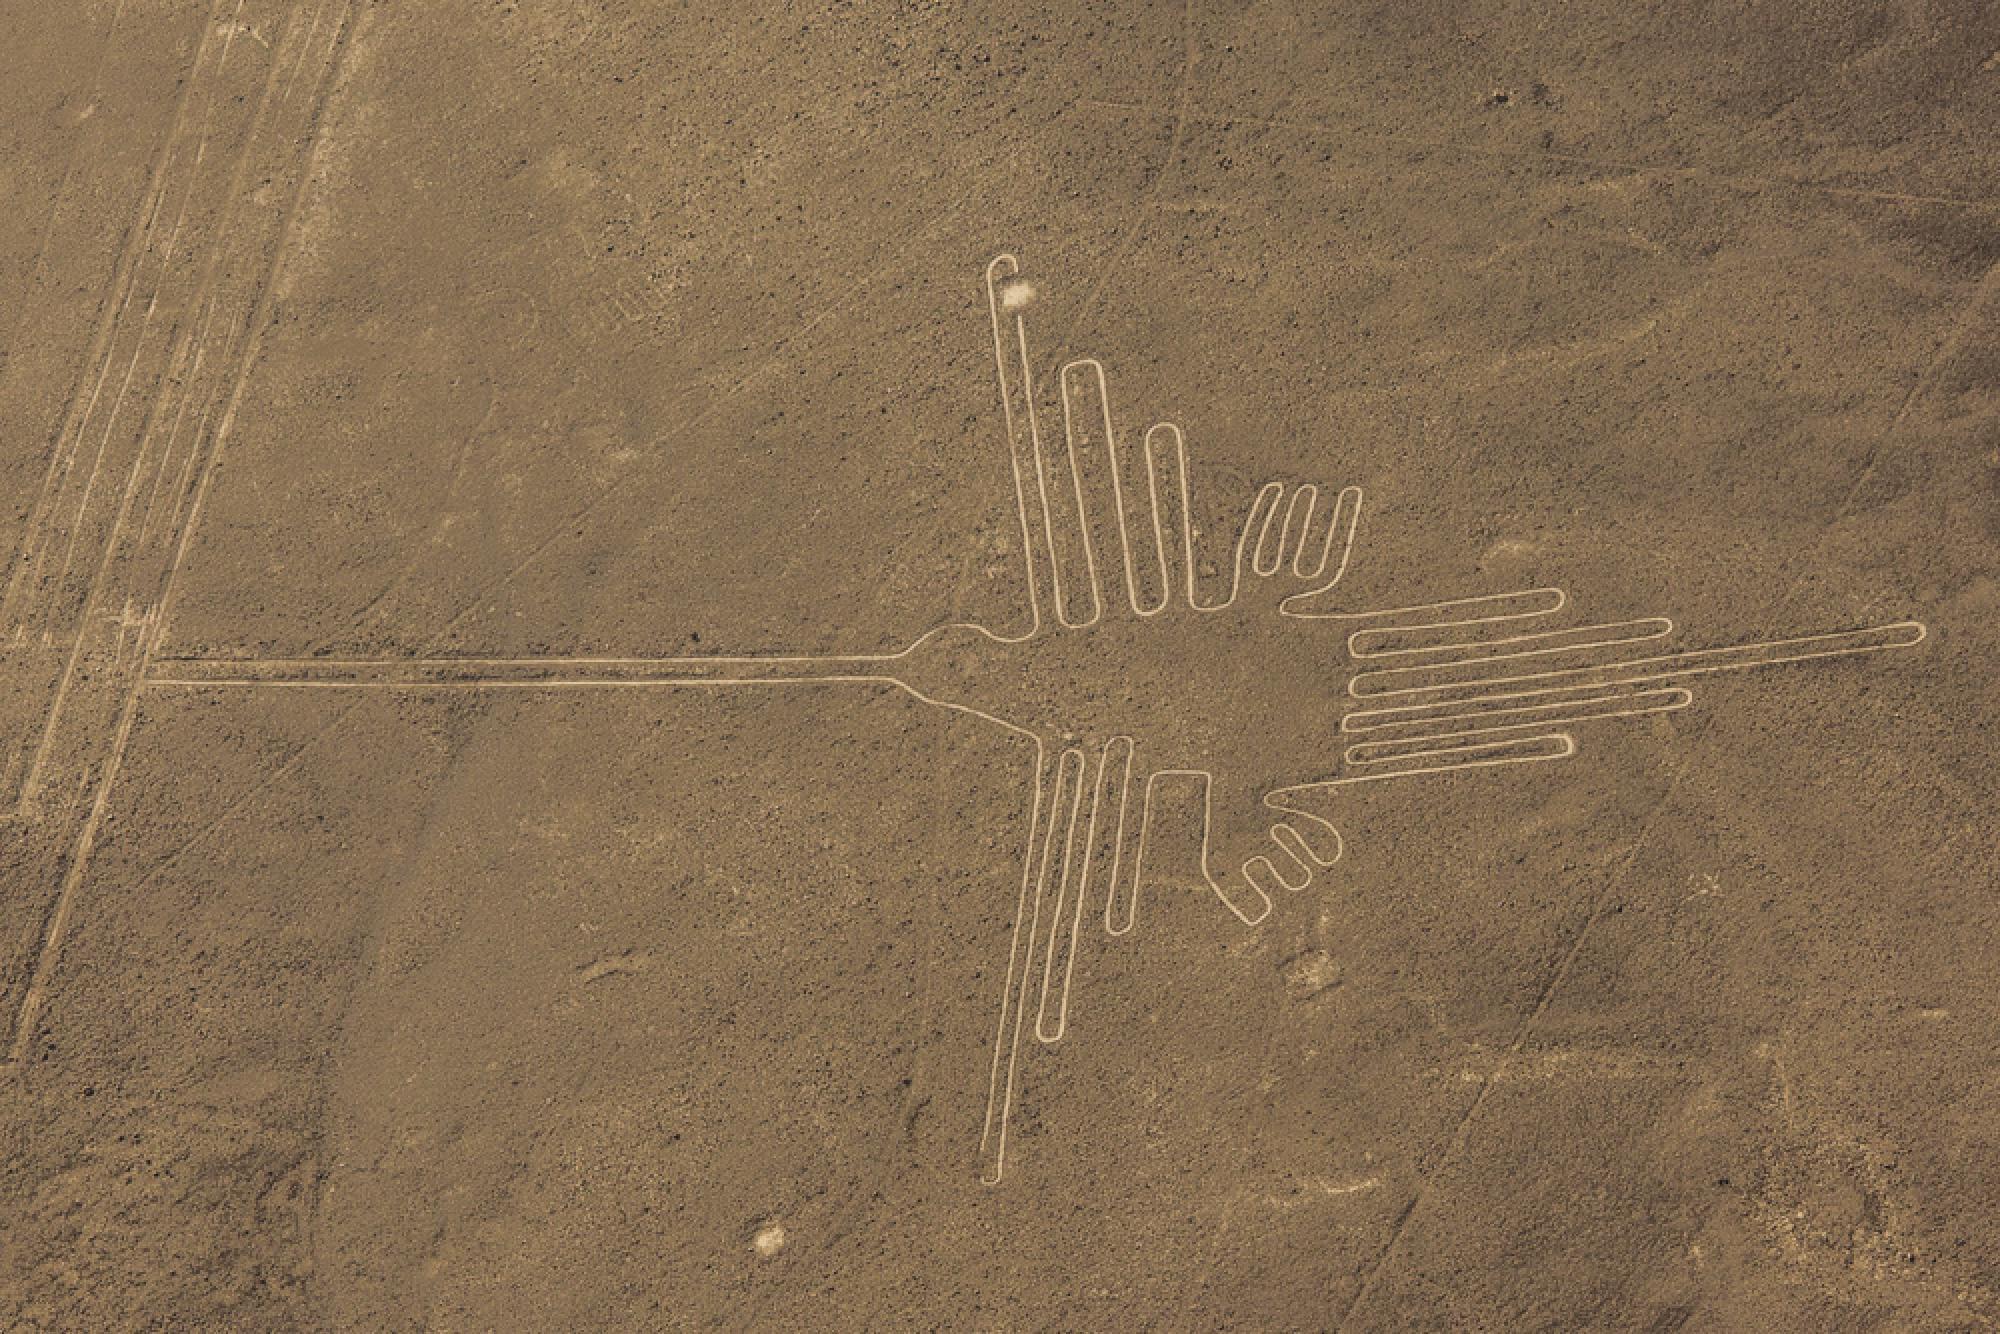 Aerodiana Nazca Classic Tour